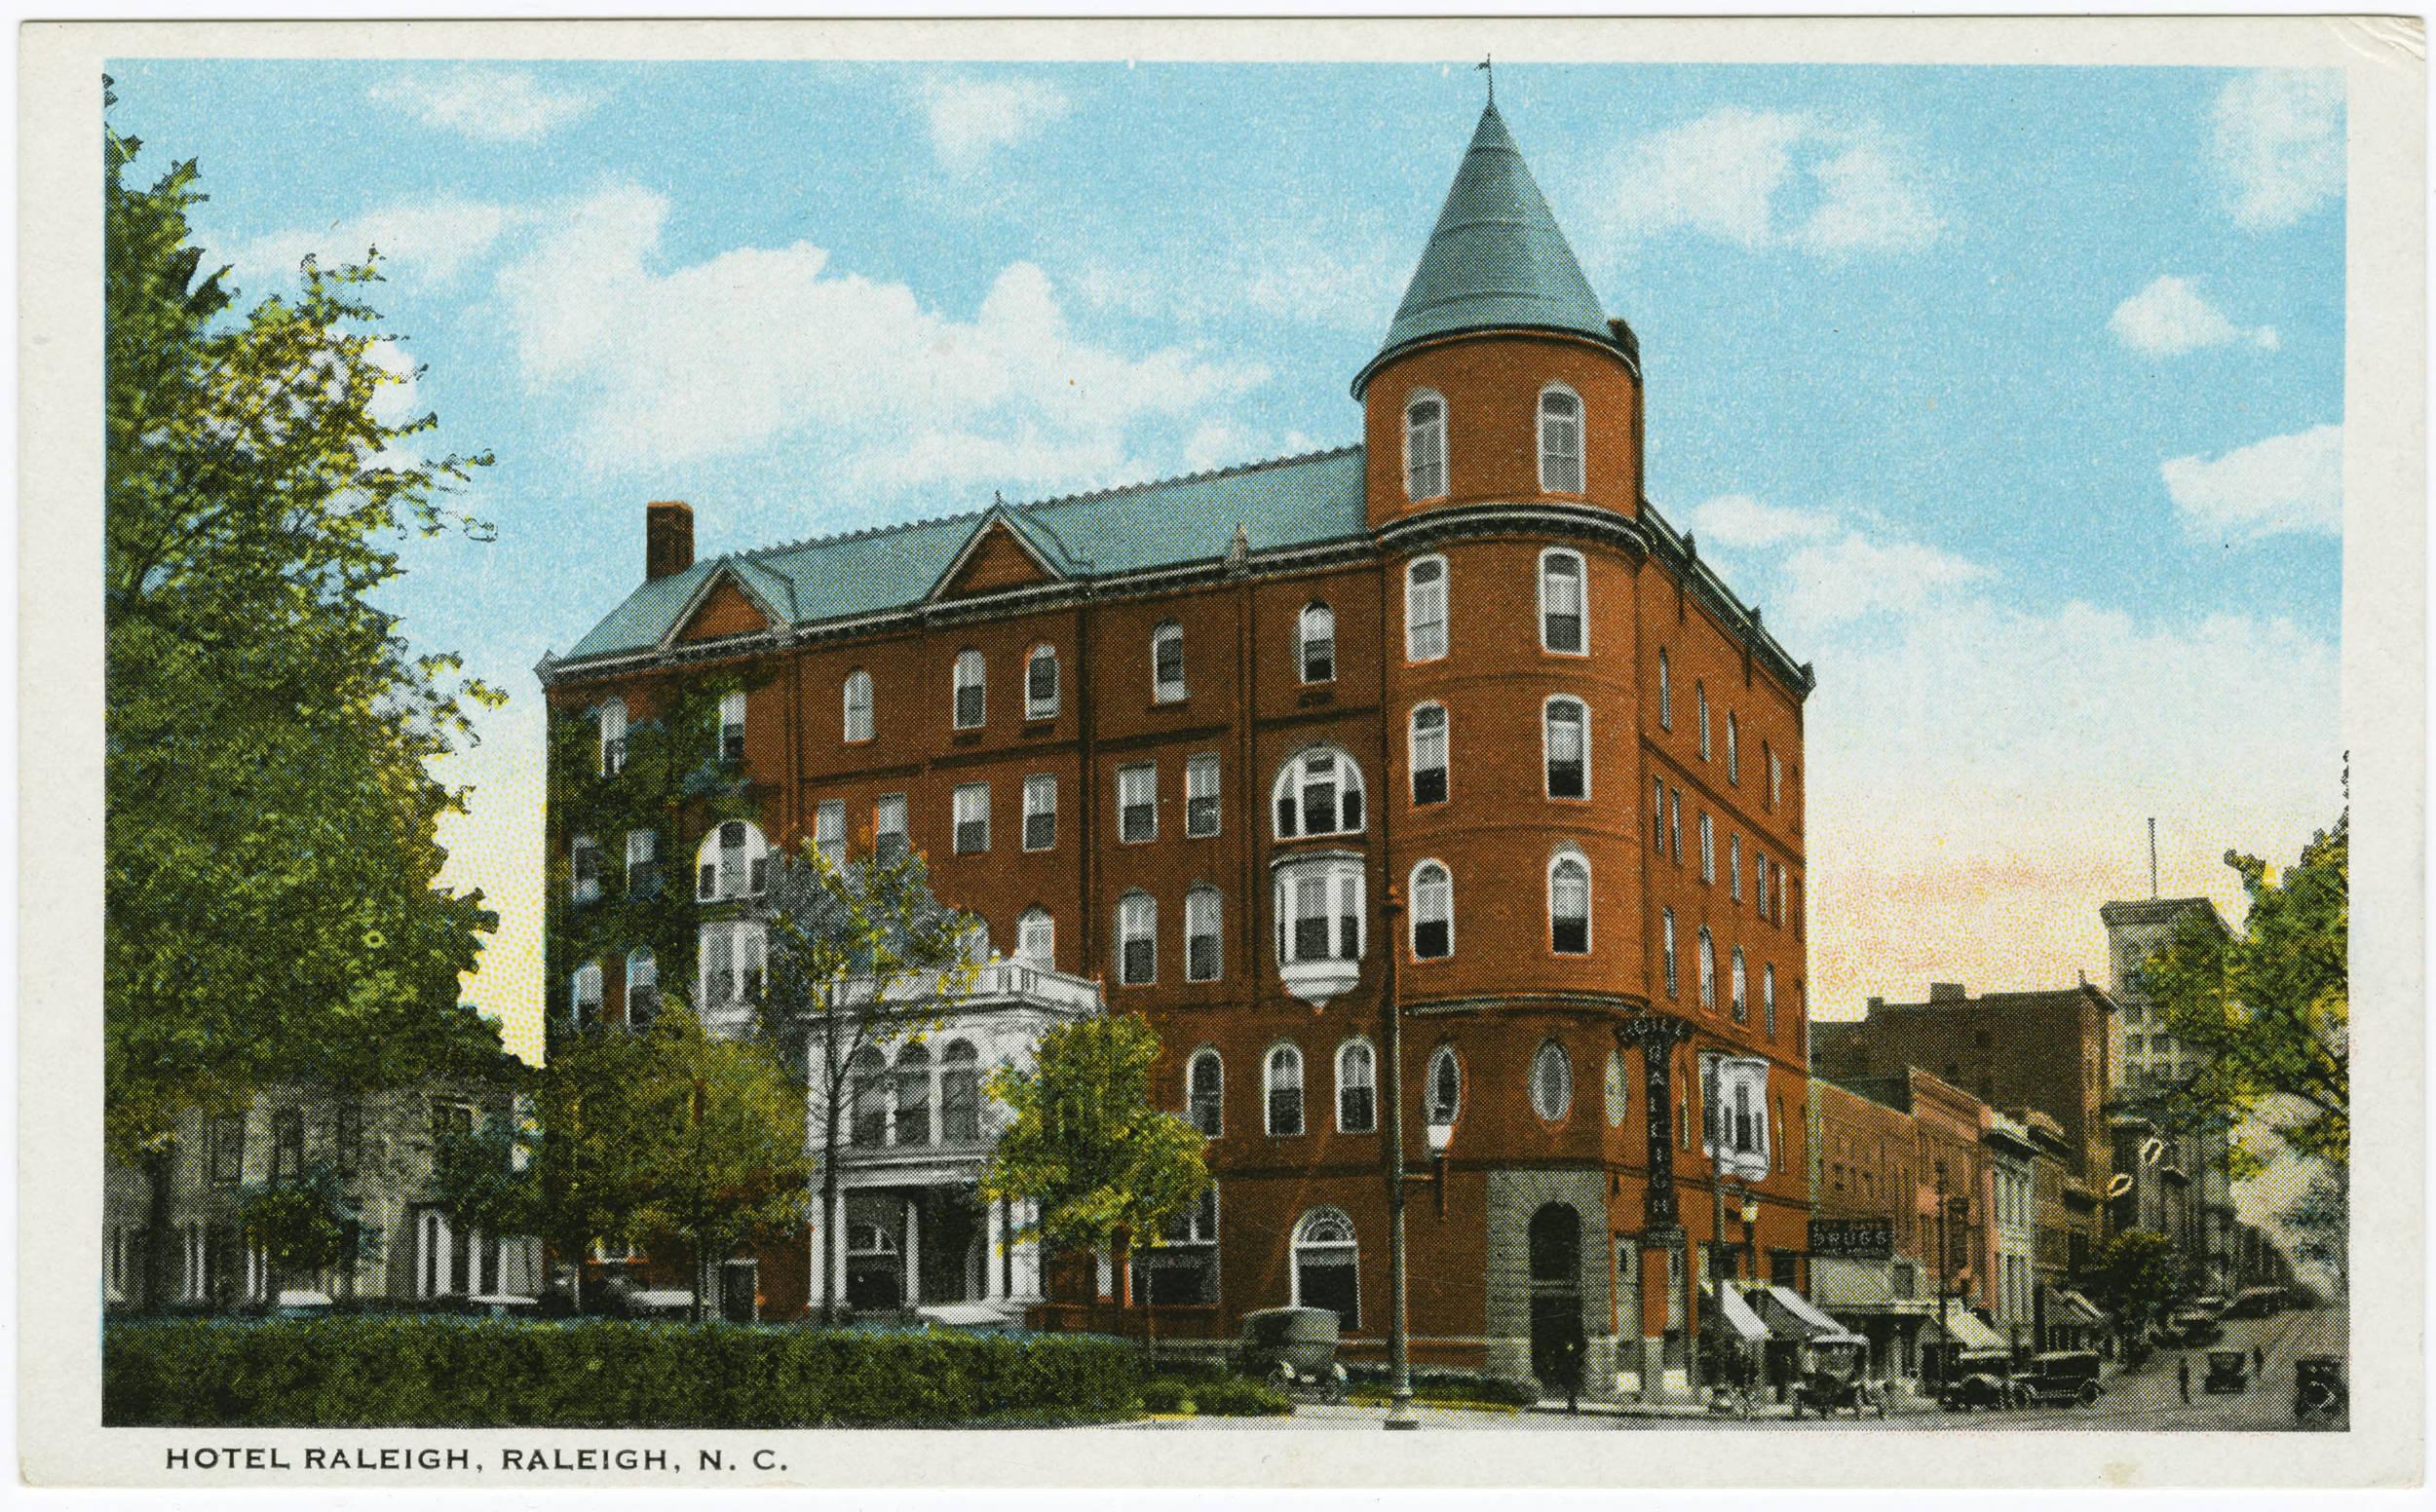 Hotel_Raleigh_Raleigh_NC (1).jpg